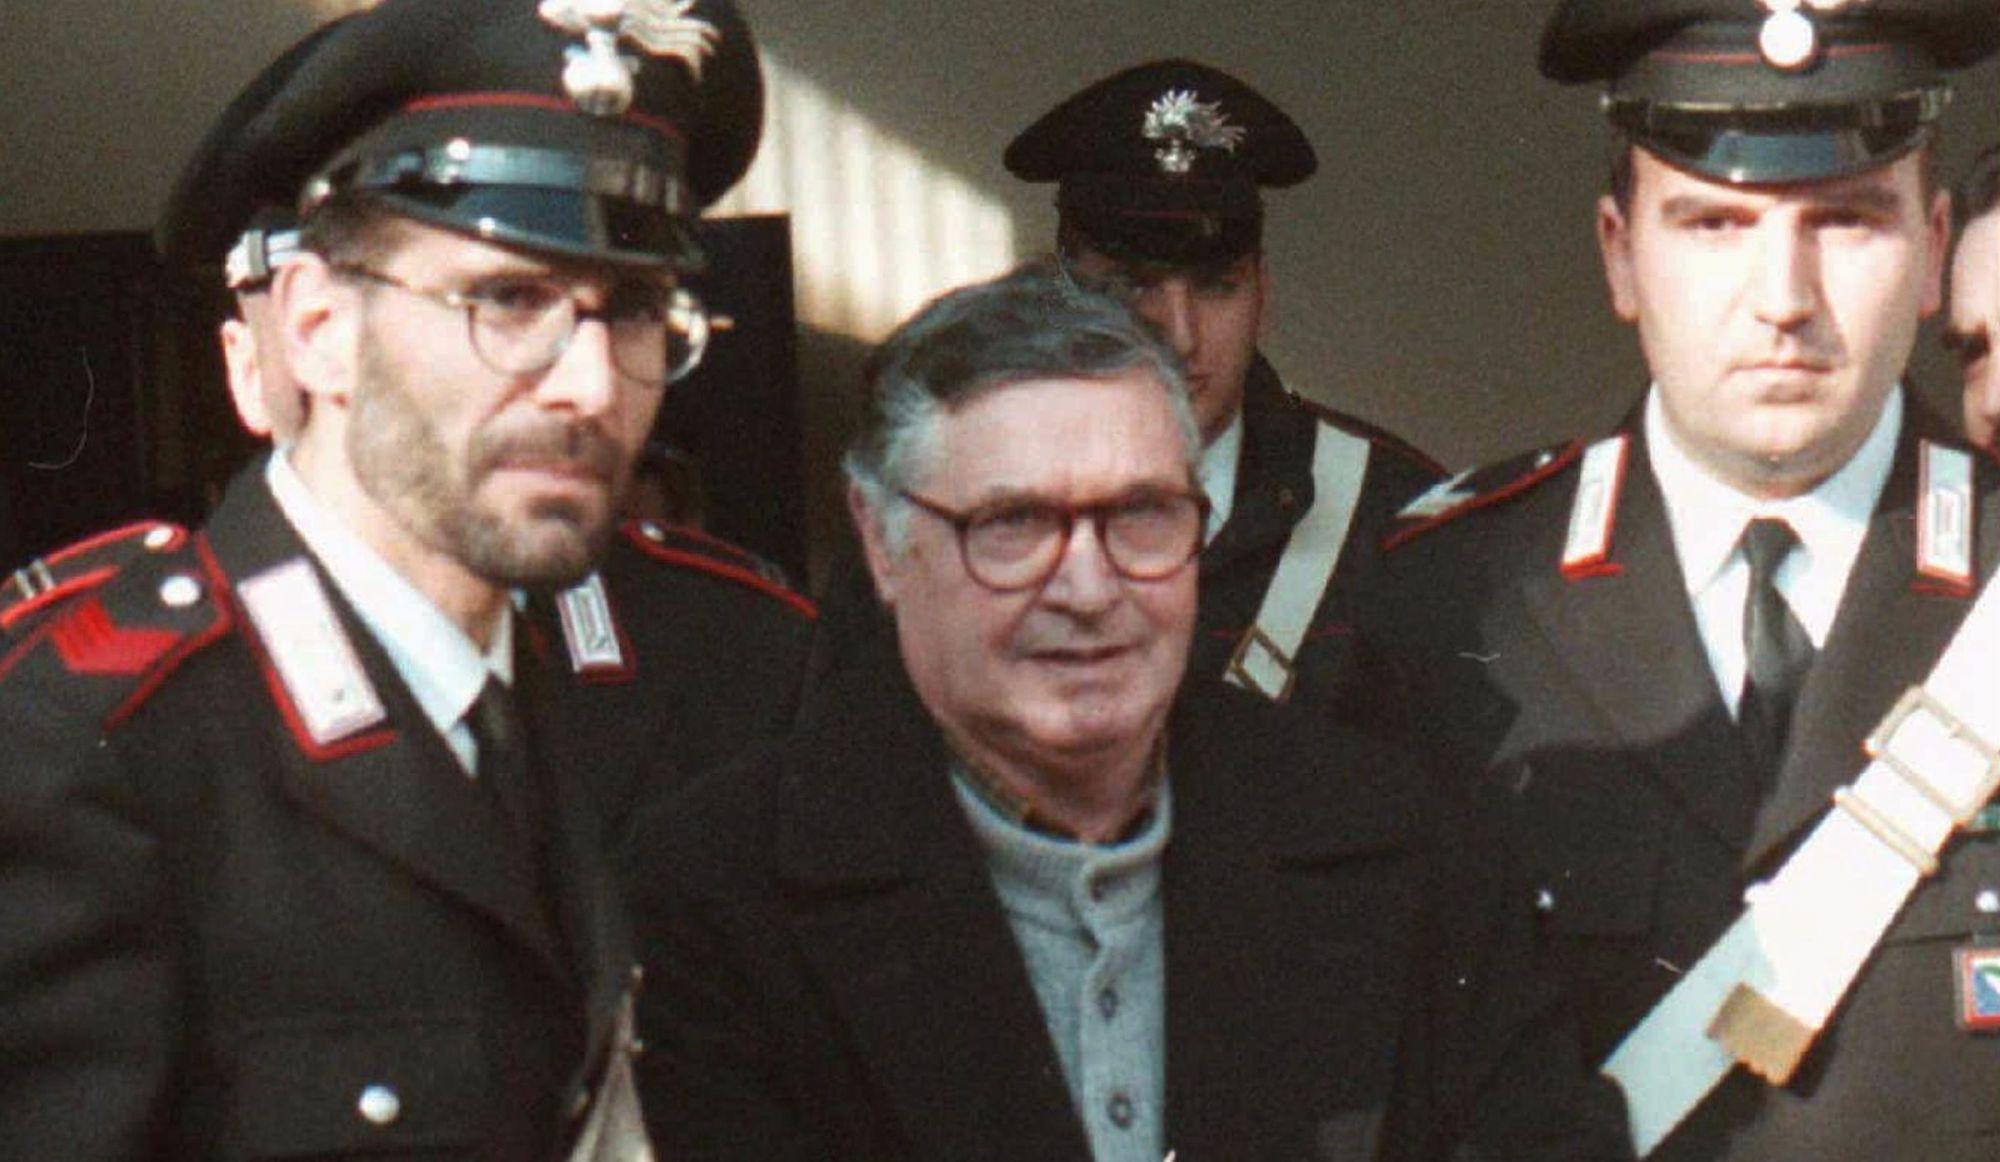 Italie: le mafioso notoire «Toto» Riina est mort